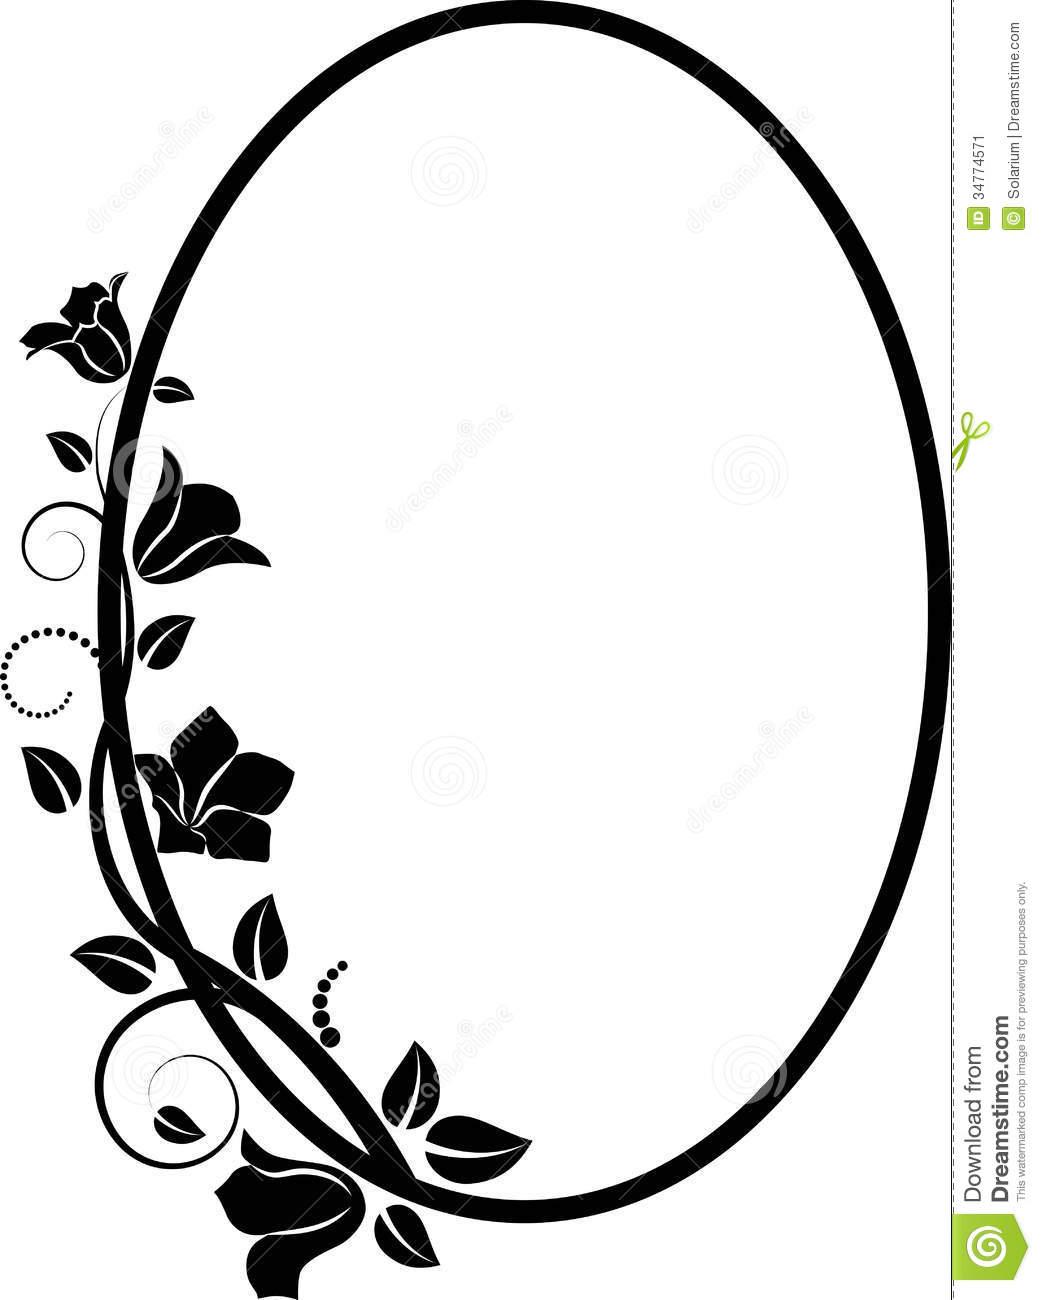 floral frame clip art clipart panda free clipart images rh clipartpanda com clip art frames and borders for free clip art frames free download